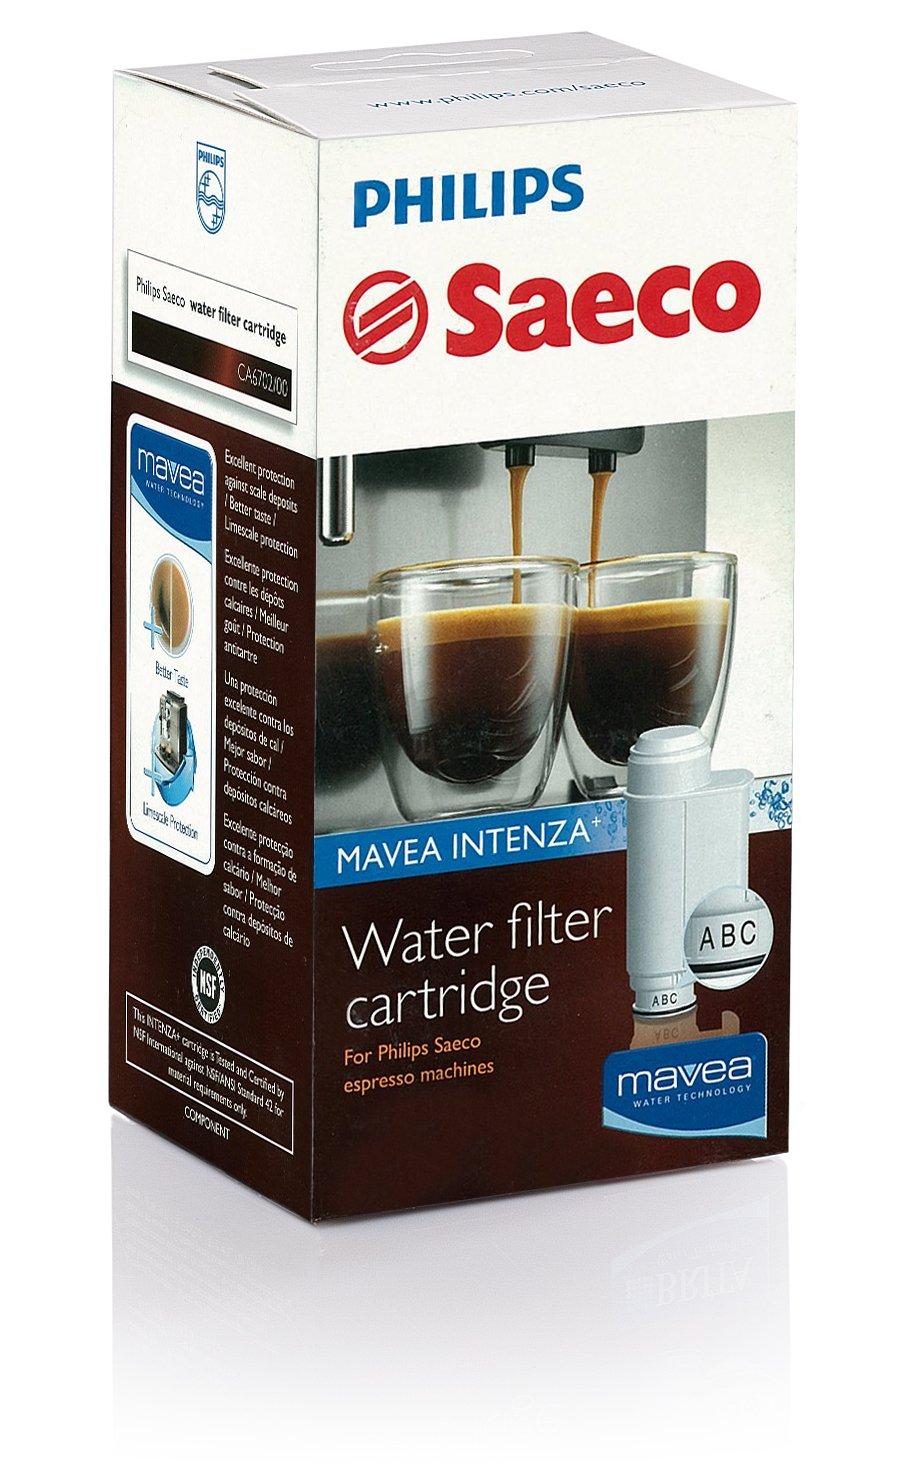 Saeco Water Filter Cartridge MAVEA Intenza CA6702/00 Philips